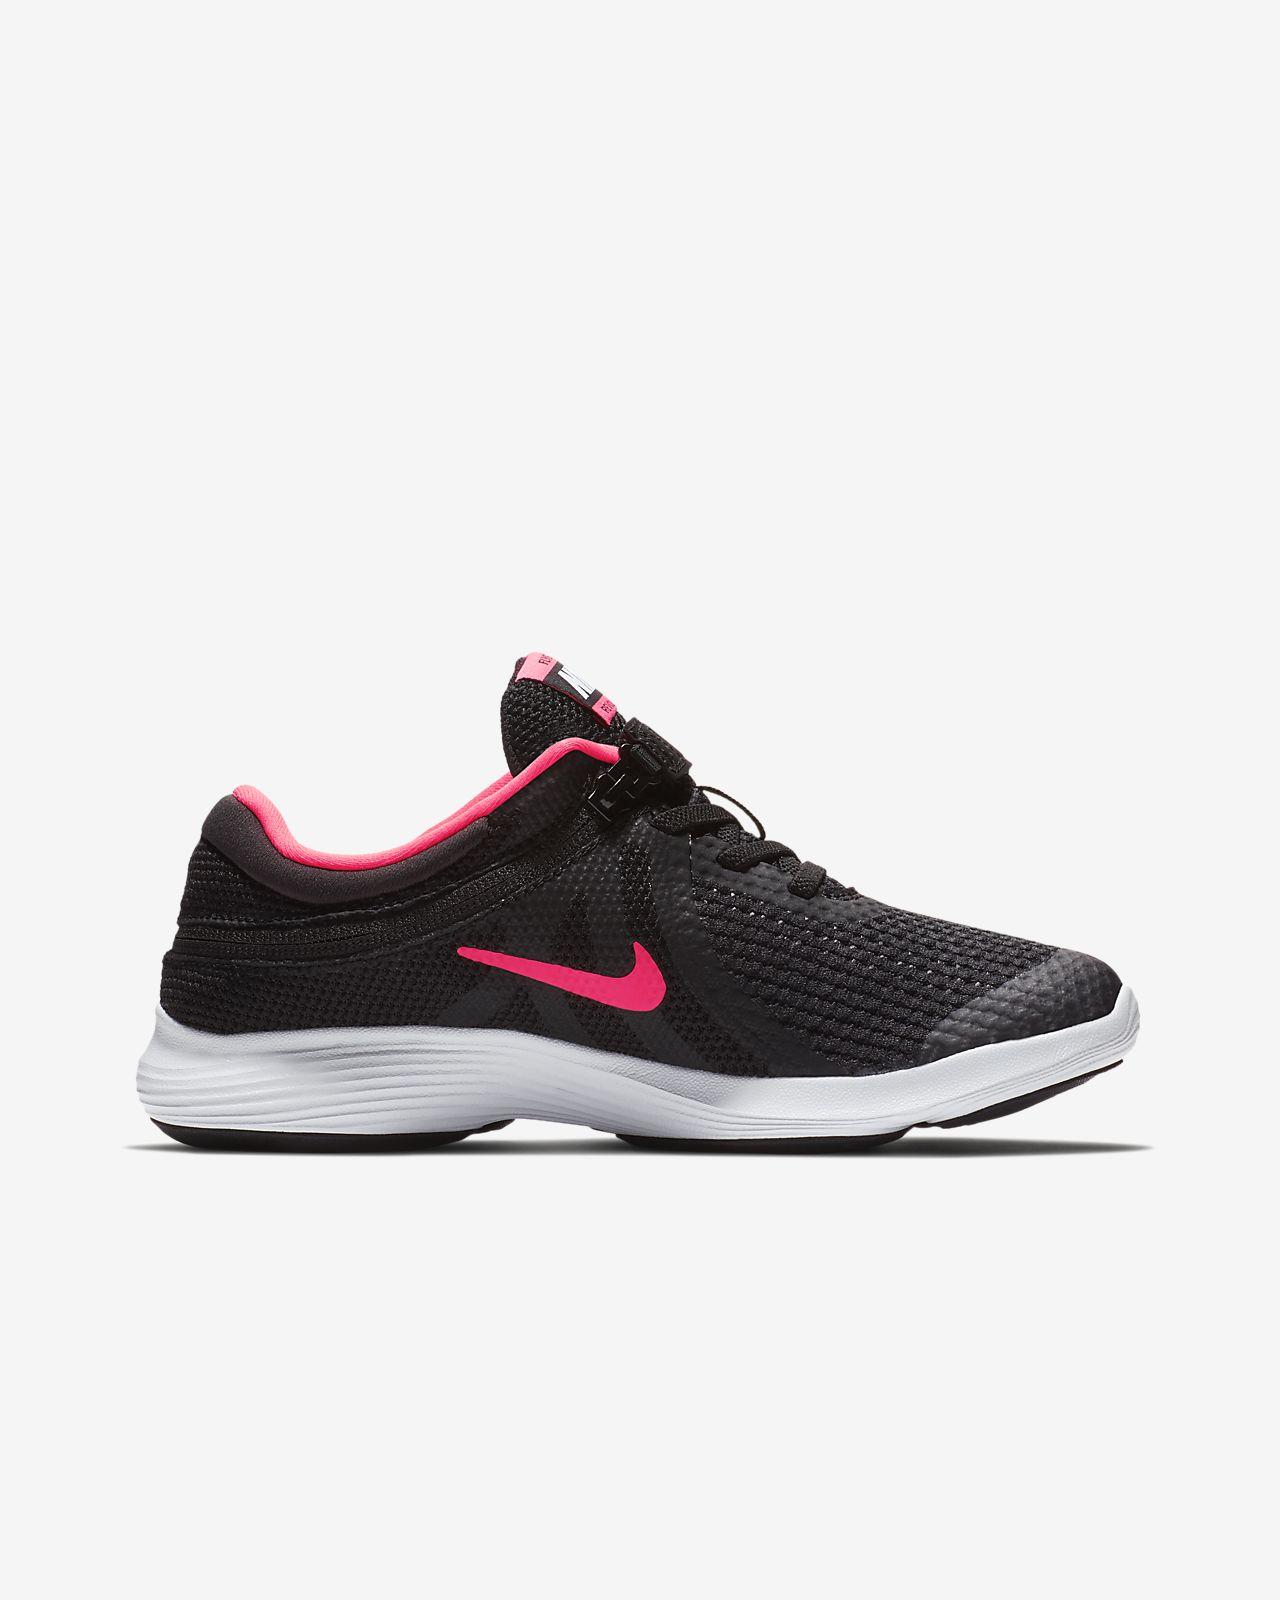 huge discount 51e3a 286ad ... Nike Revolution 4 FlyEase Big Kids  Running Shoe